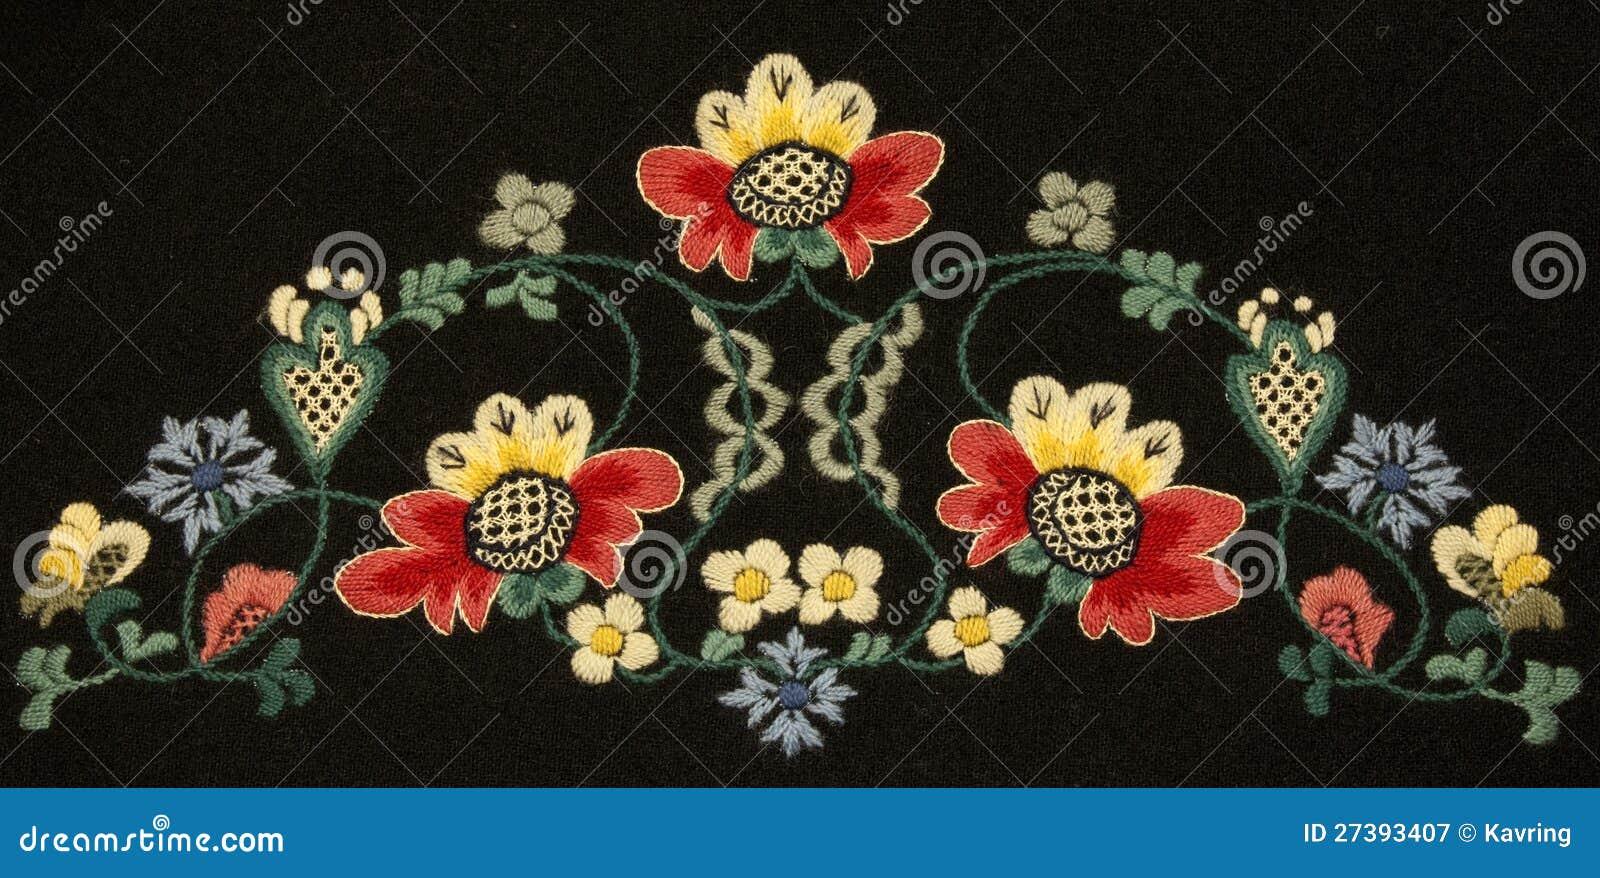 Norwegian Embroidery Designs